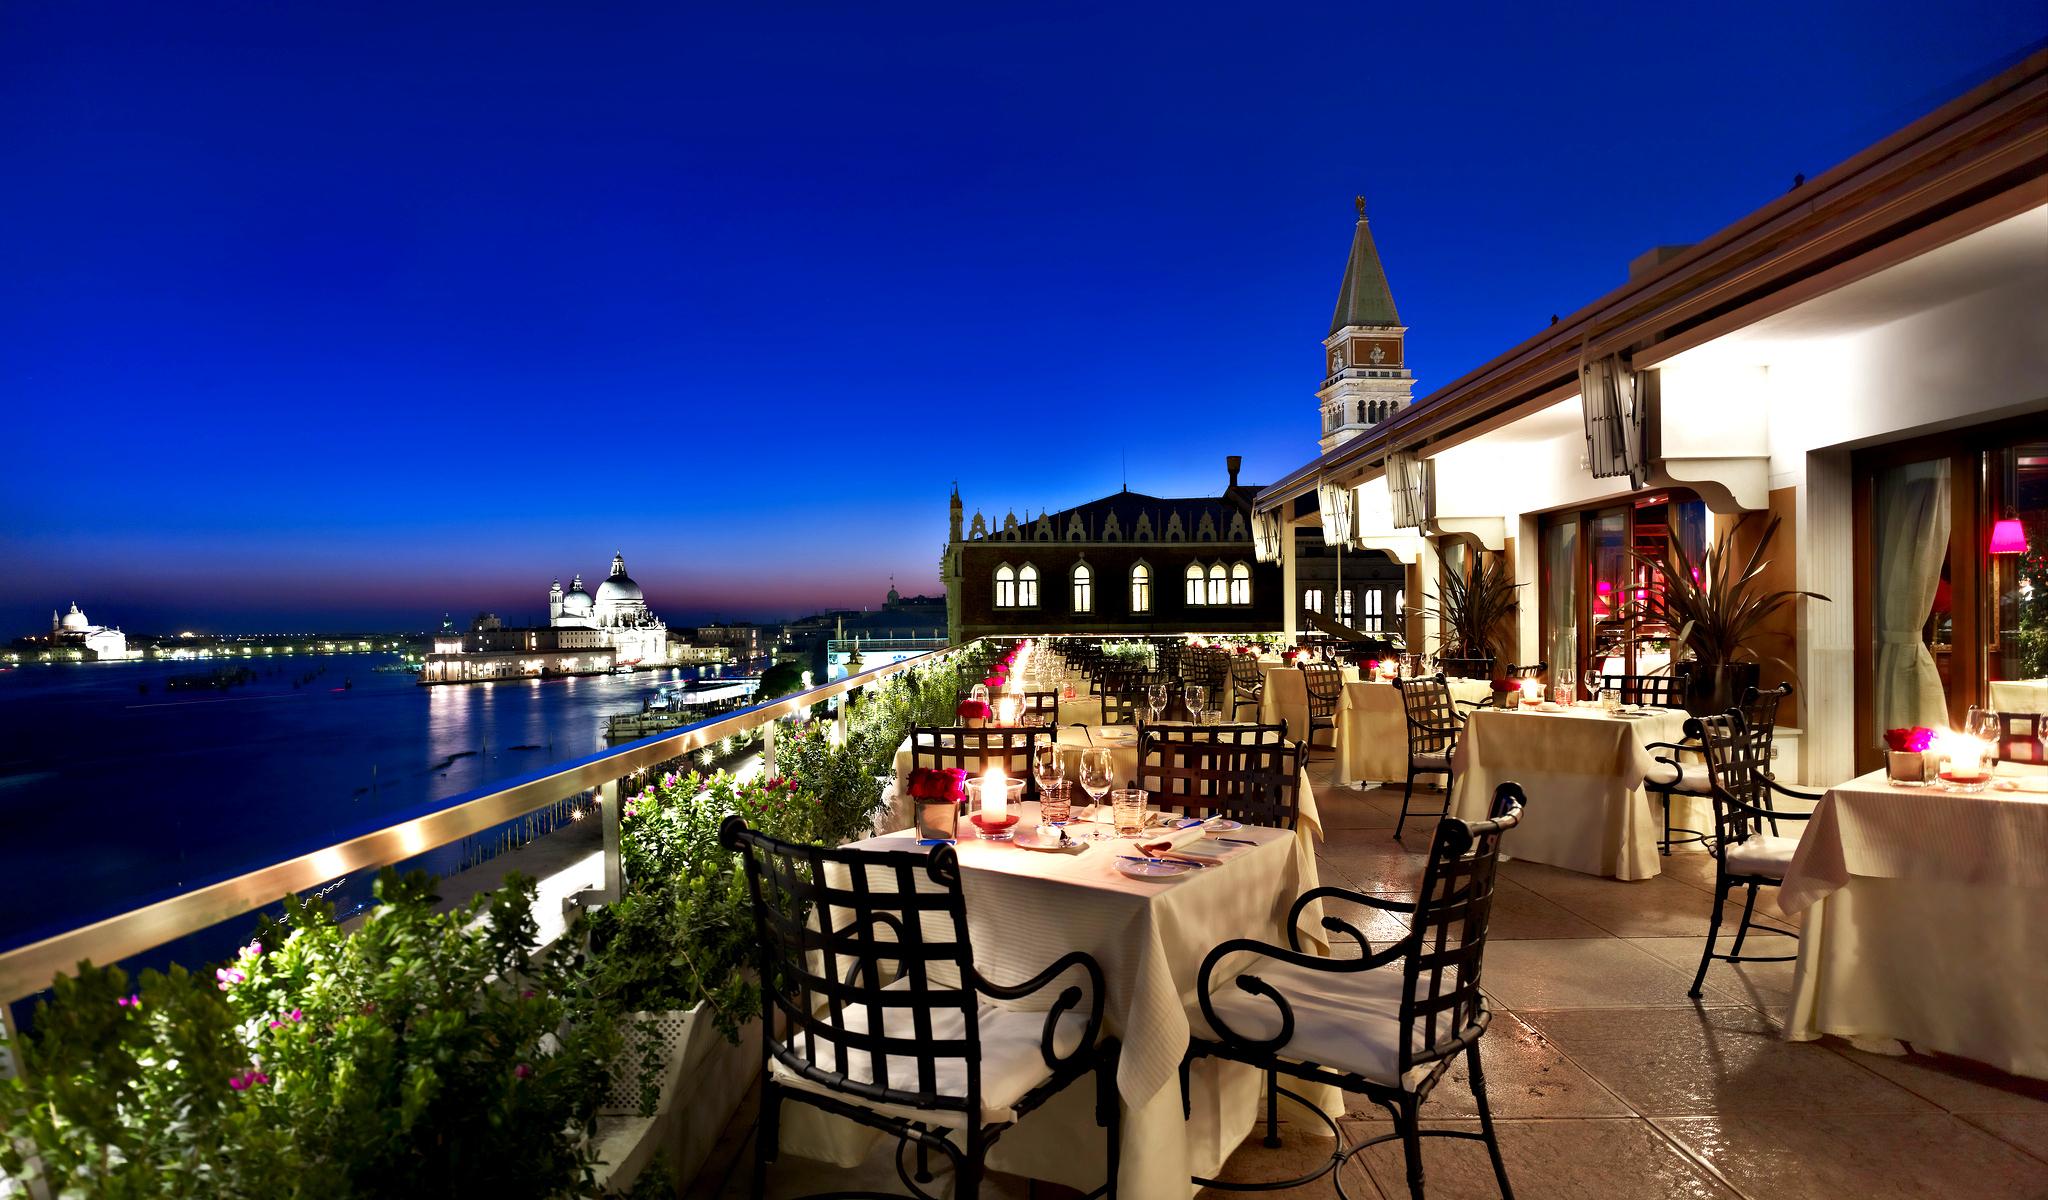 Отдых во Флоренции - Ресторан с видом на море